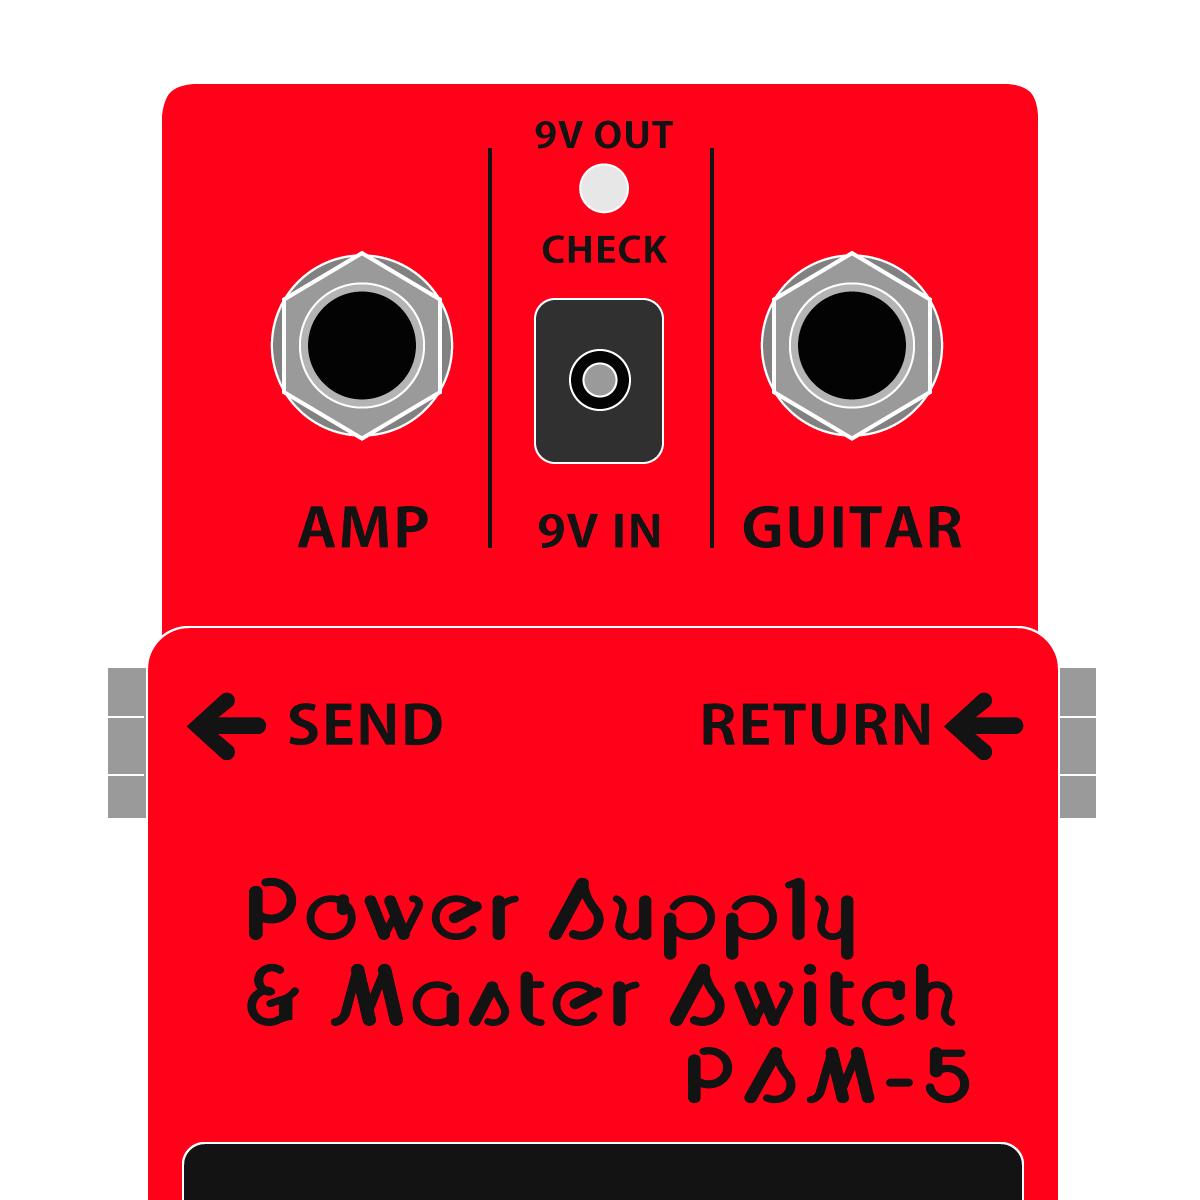 PSM-5 Power Supply & Master Switch(パワーサプライ&マスタースイッチ)